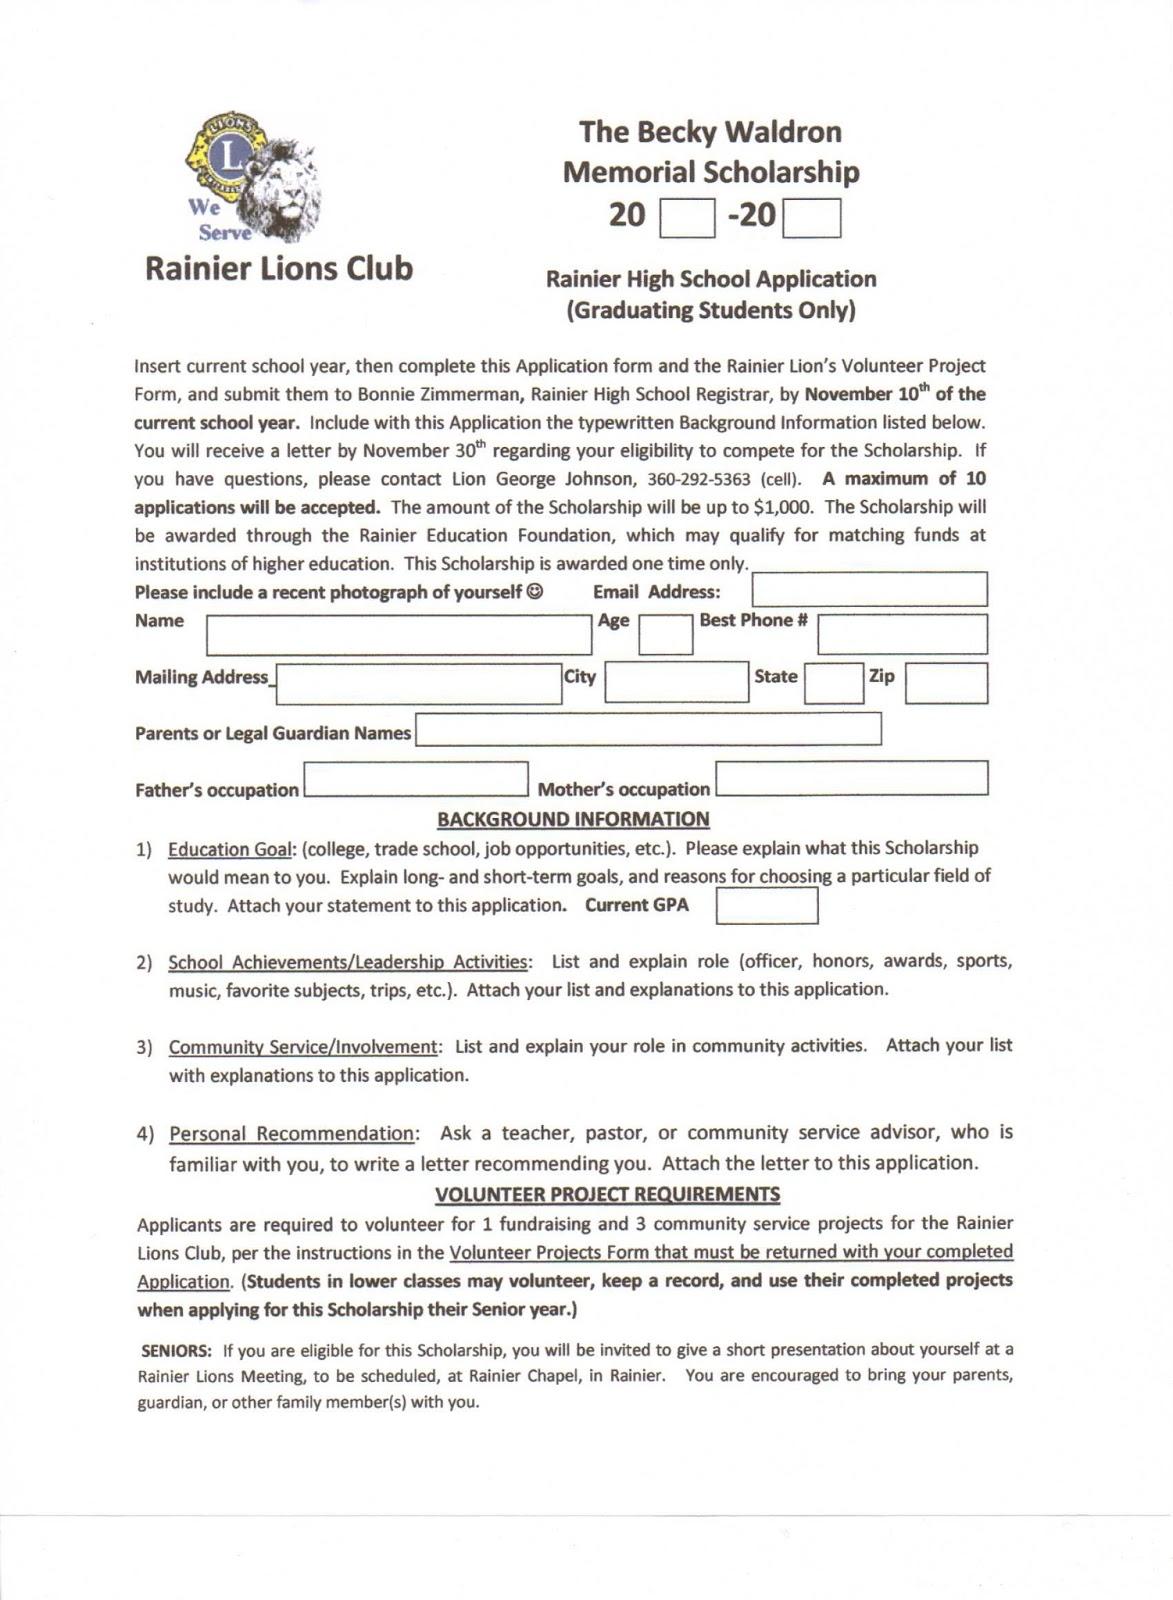 rainier lions club becky waldron memorial scholarship application